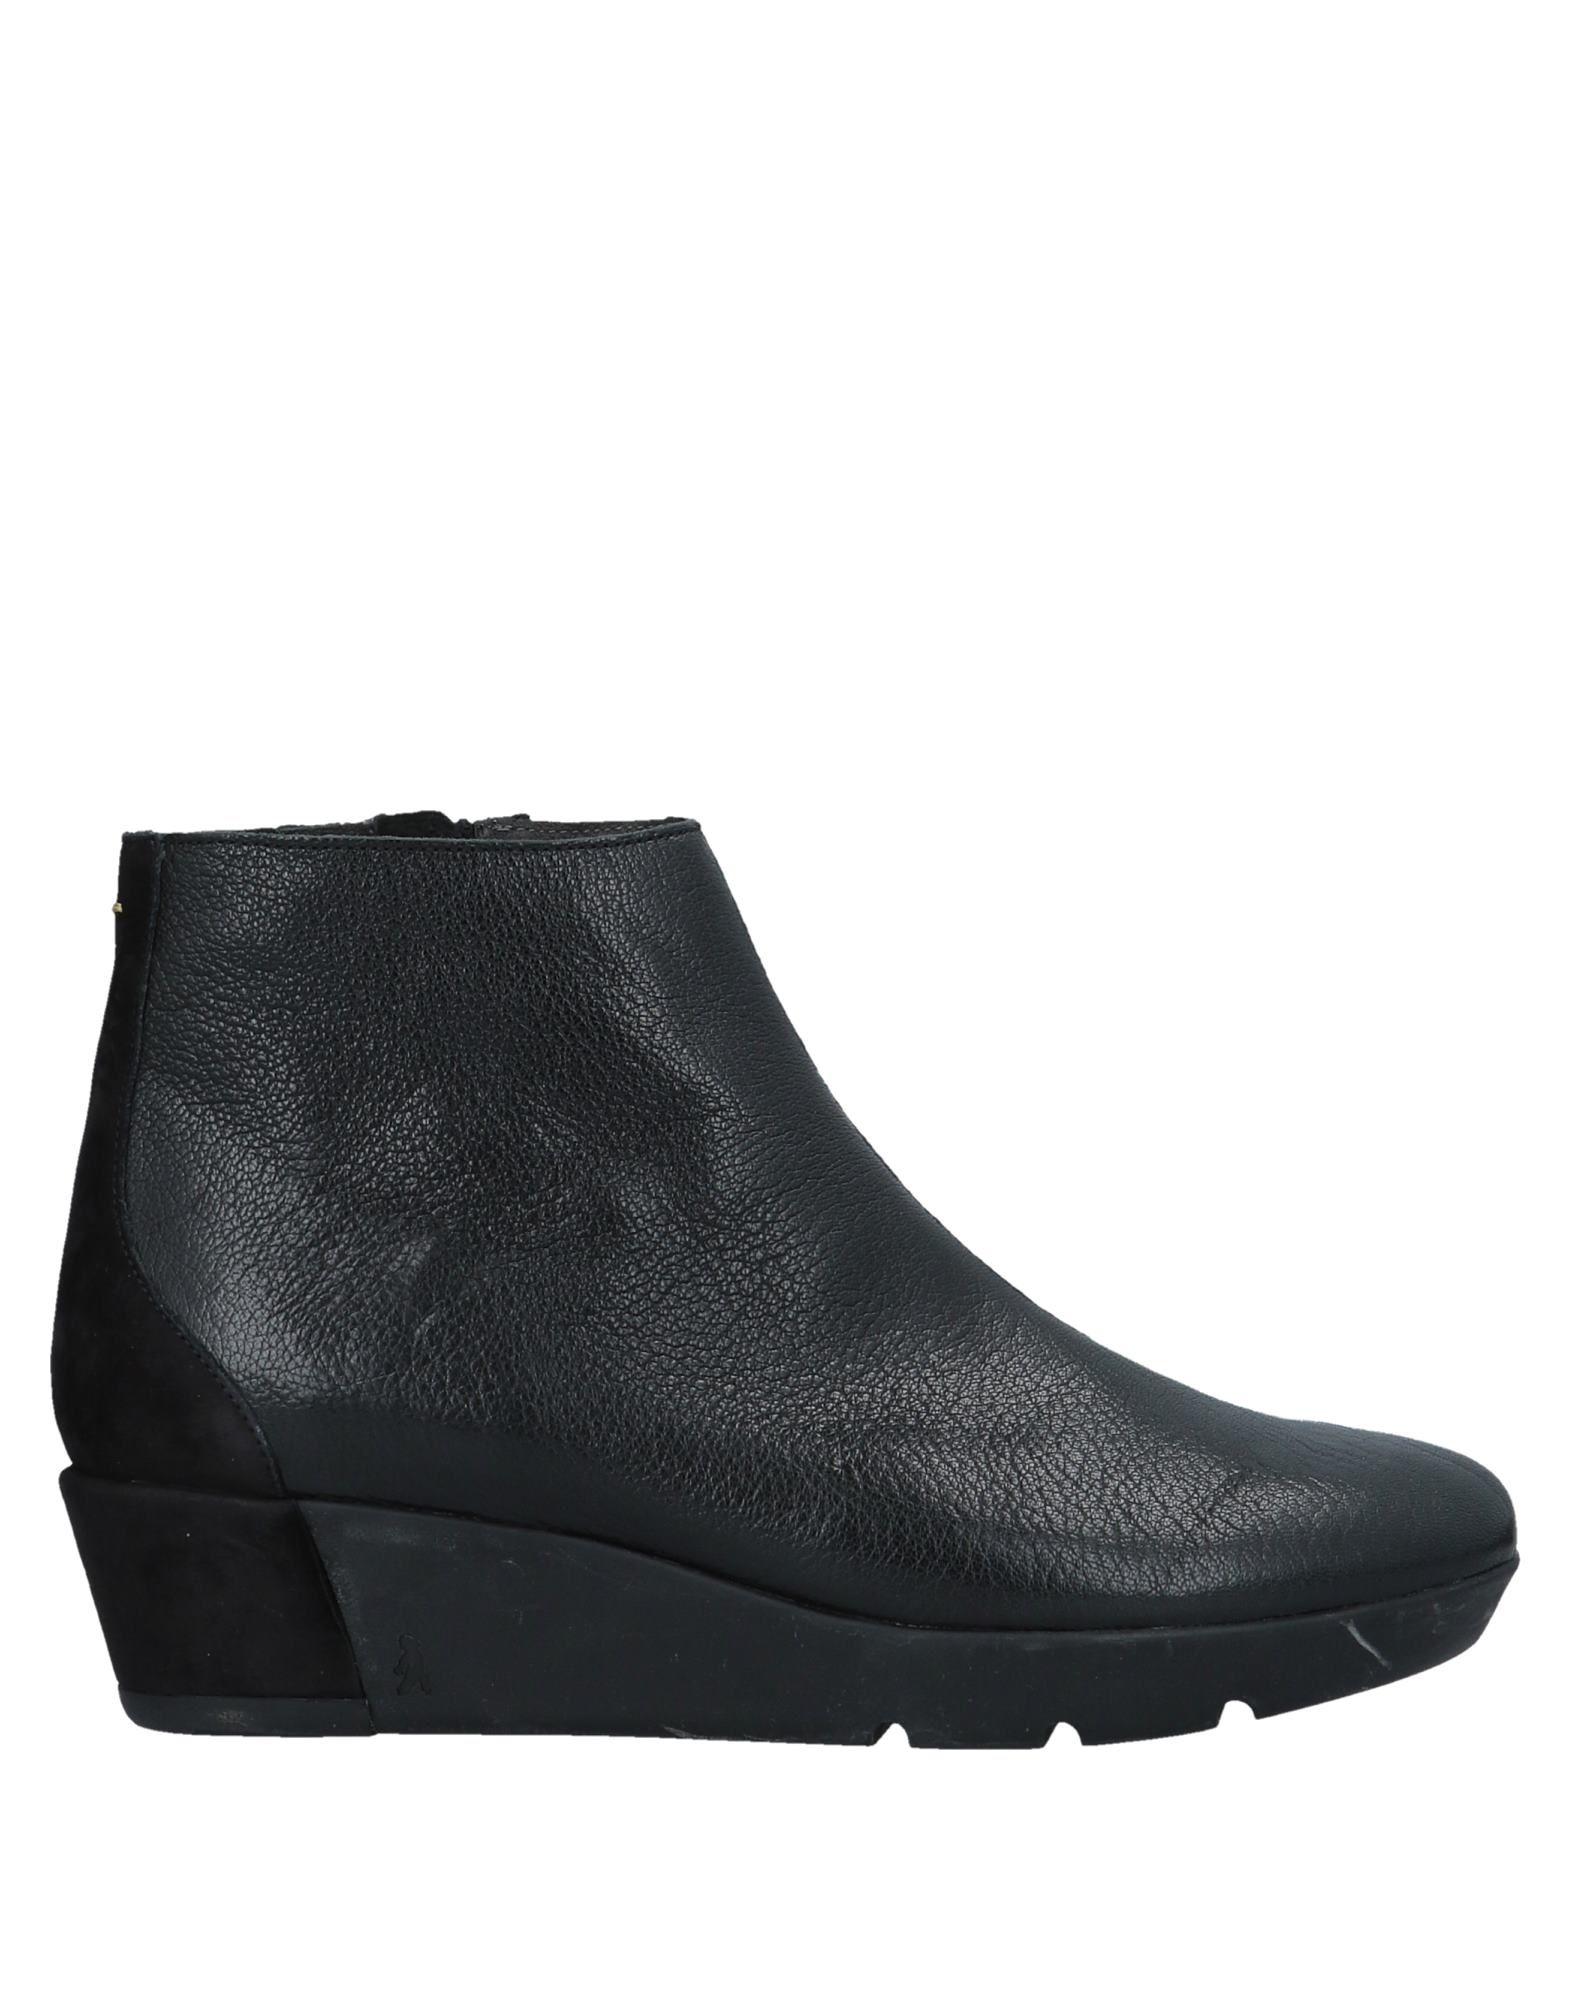 Benvado Stiefelette Damen  Schuhe 11535739OK Gute Qualität beliebte Schuhe  4865fe